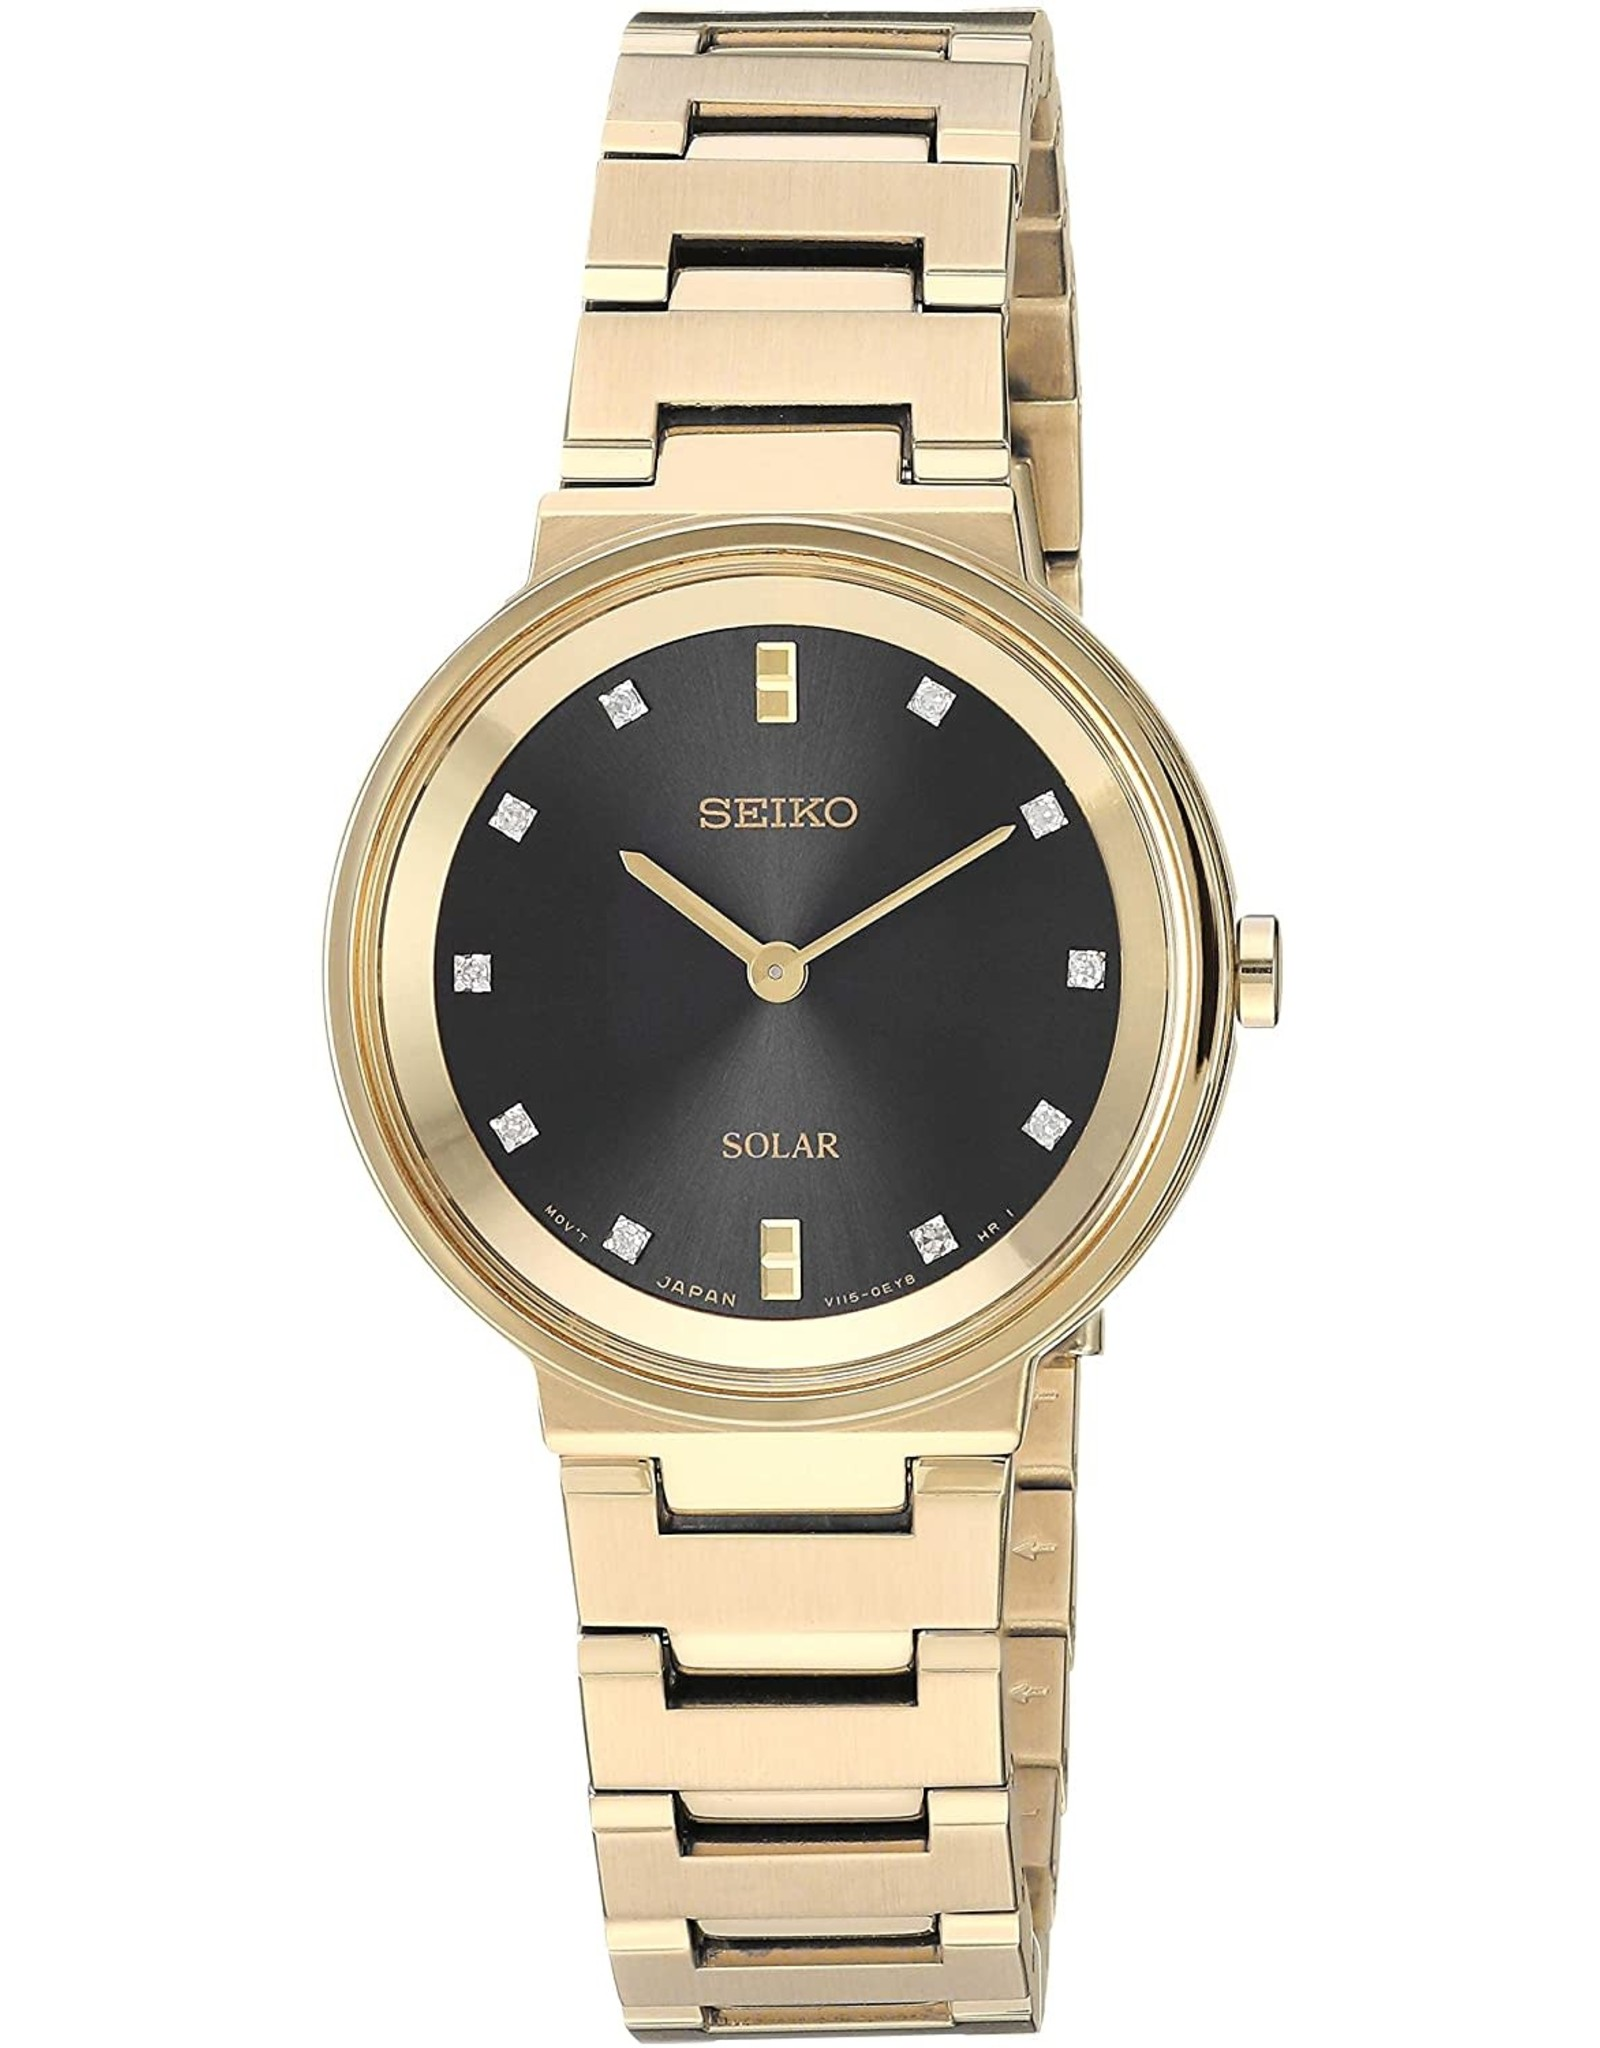 Ladies Seiko Solar Essentials Yellow Tone Watch with Diamond Dial, 27.5mm